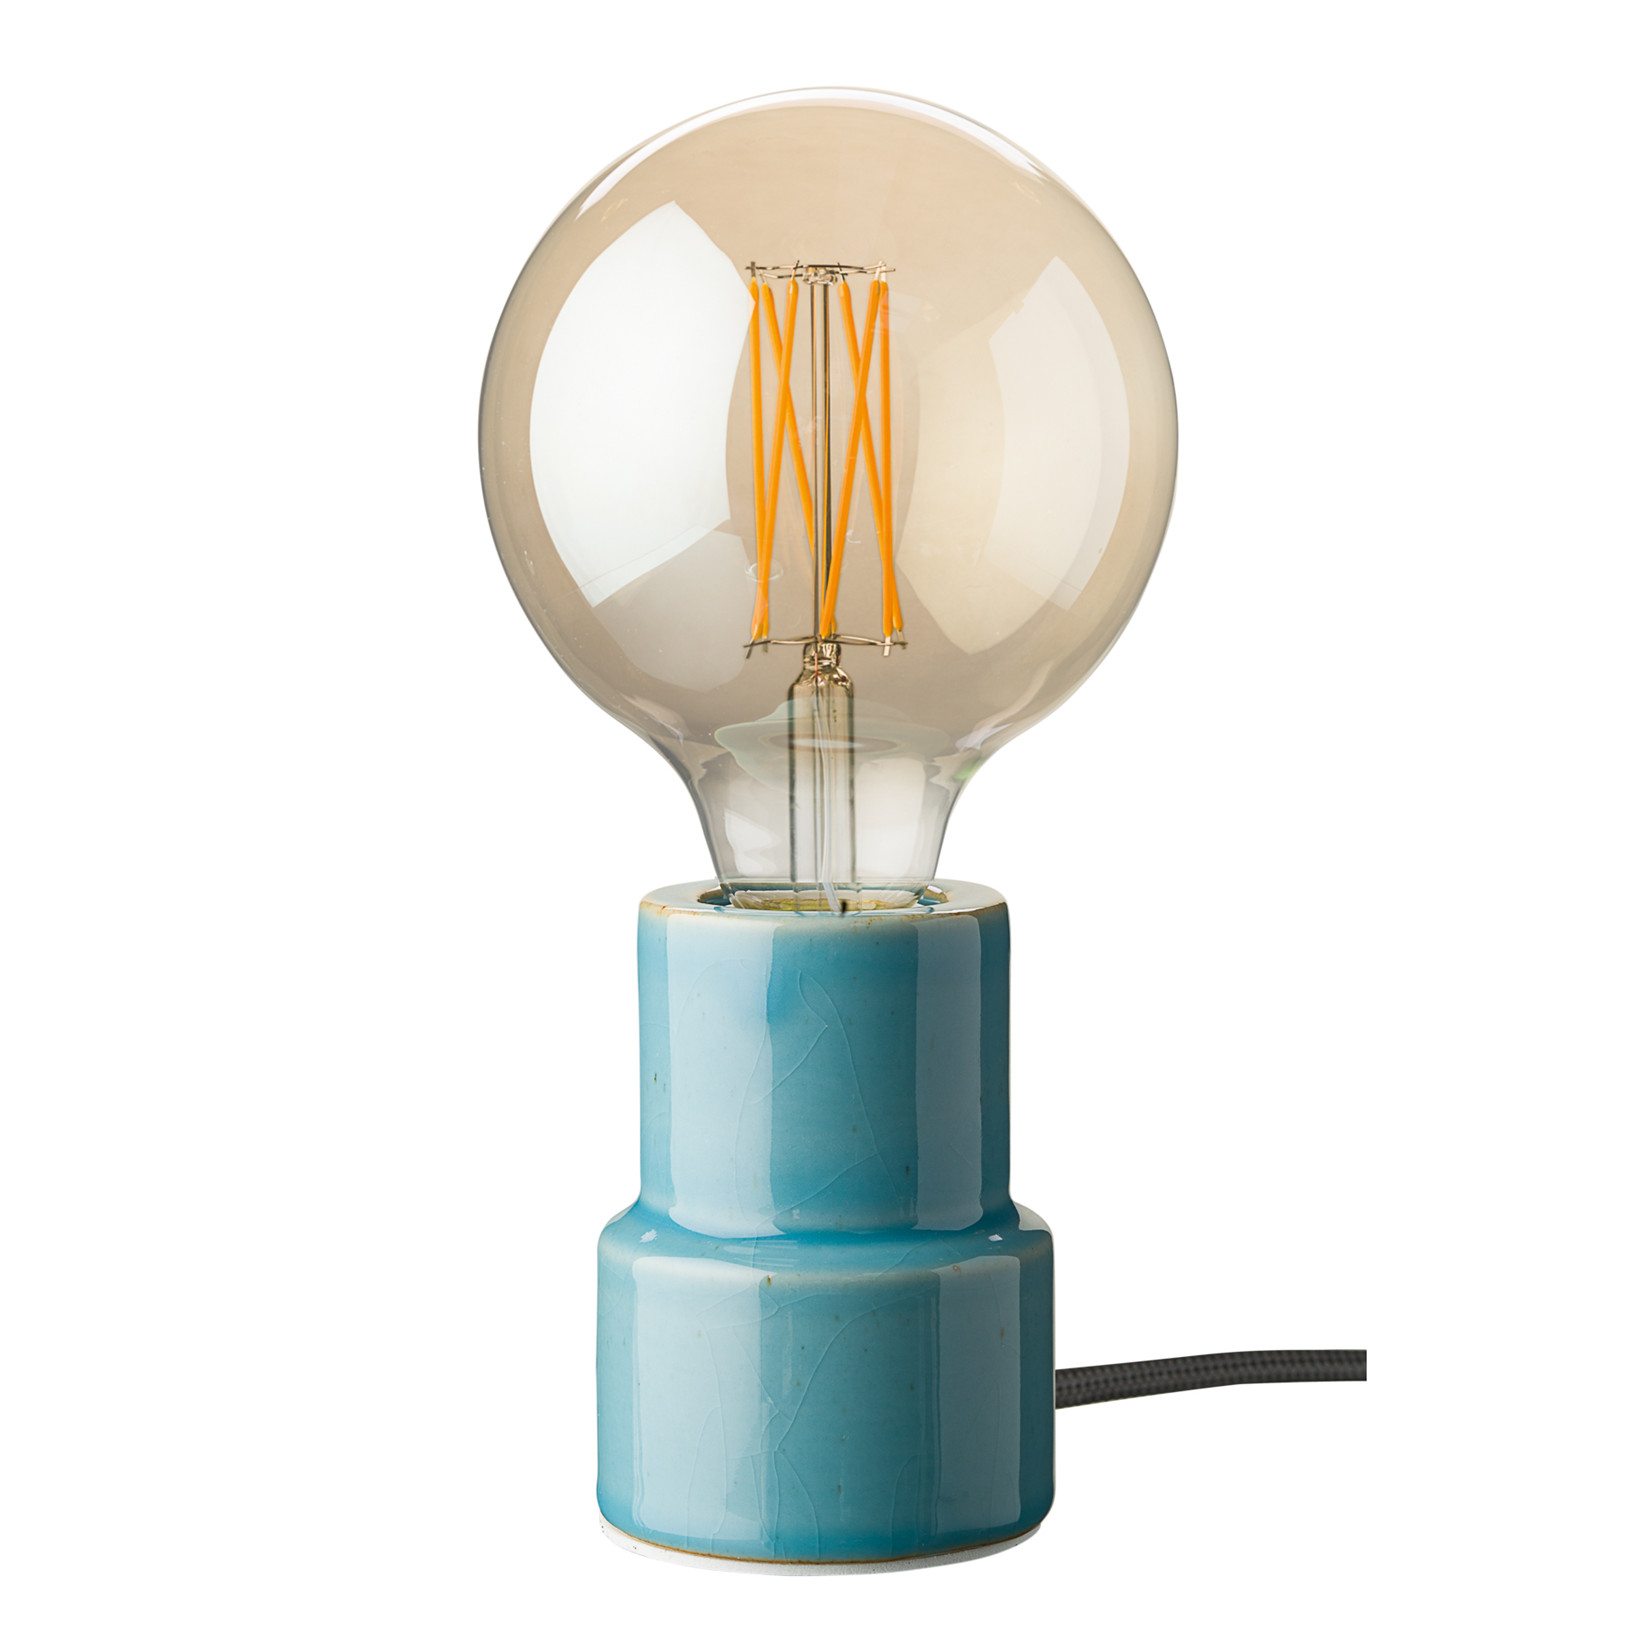 CRÉTON MAISON Ziggi Lampe 300 ONE